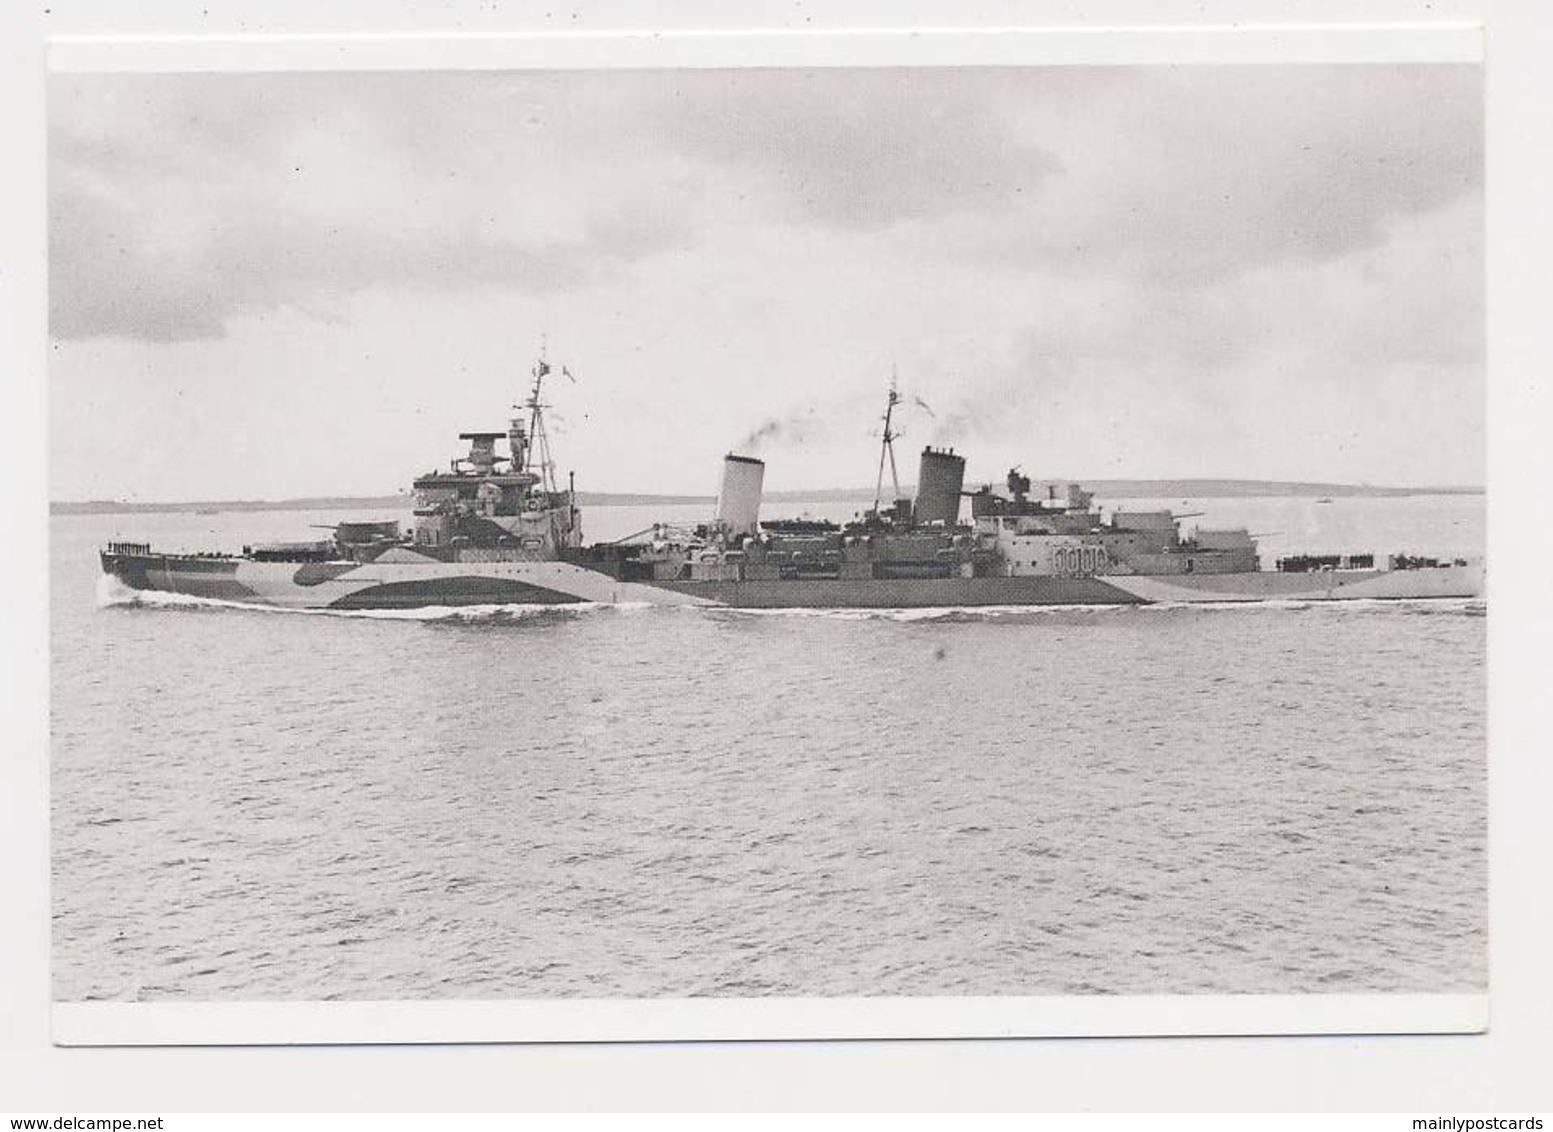 AK08  Shipping/military - HMS Belfast - Warships